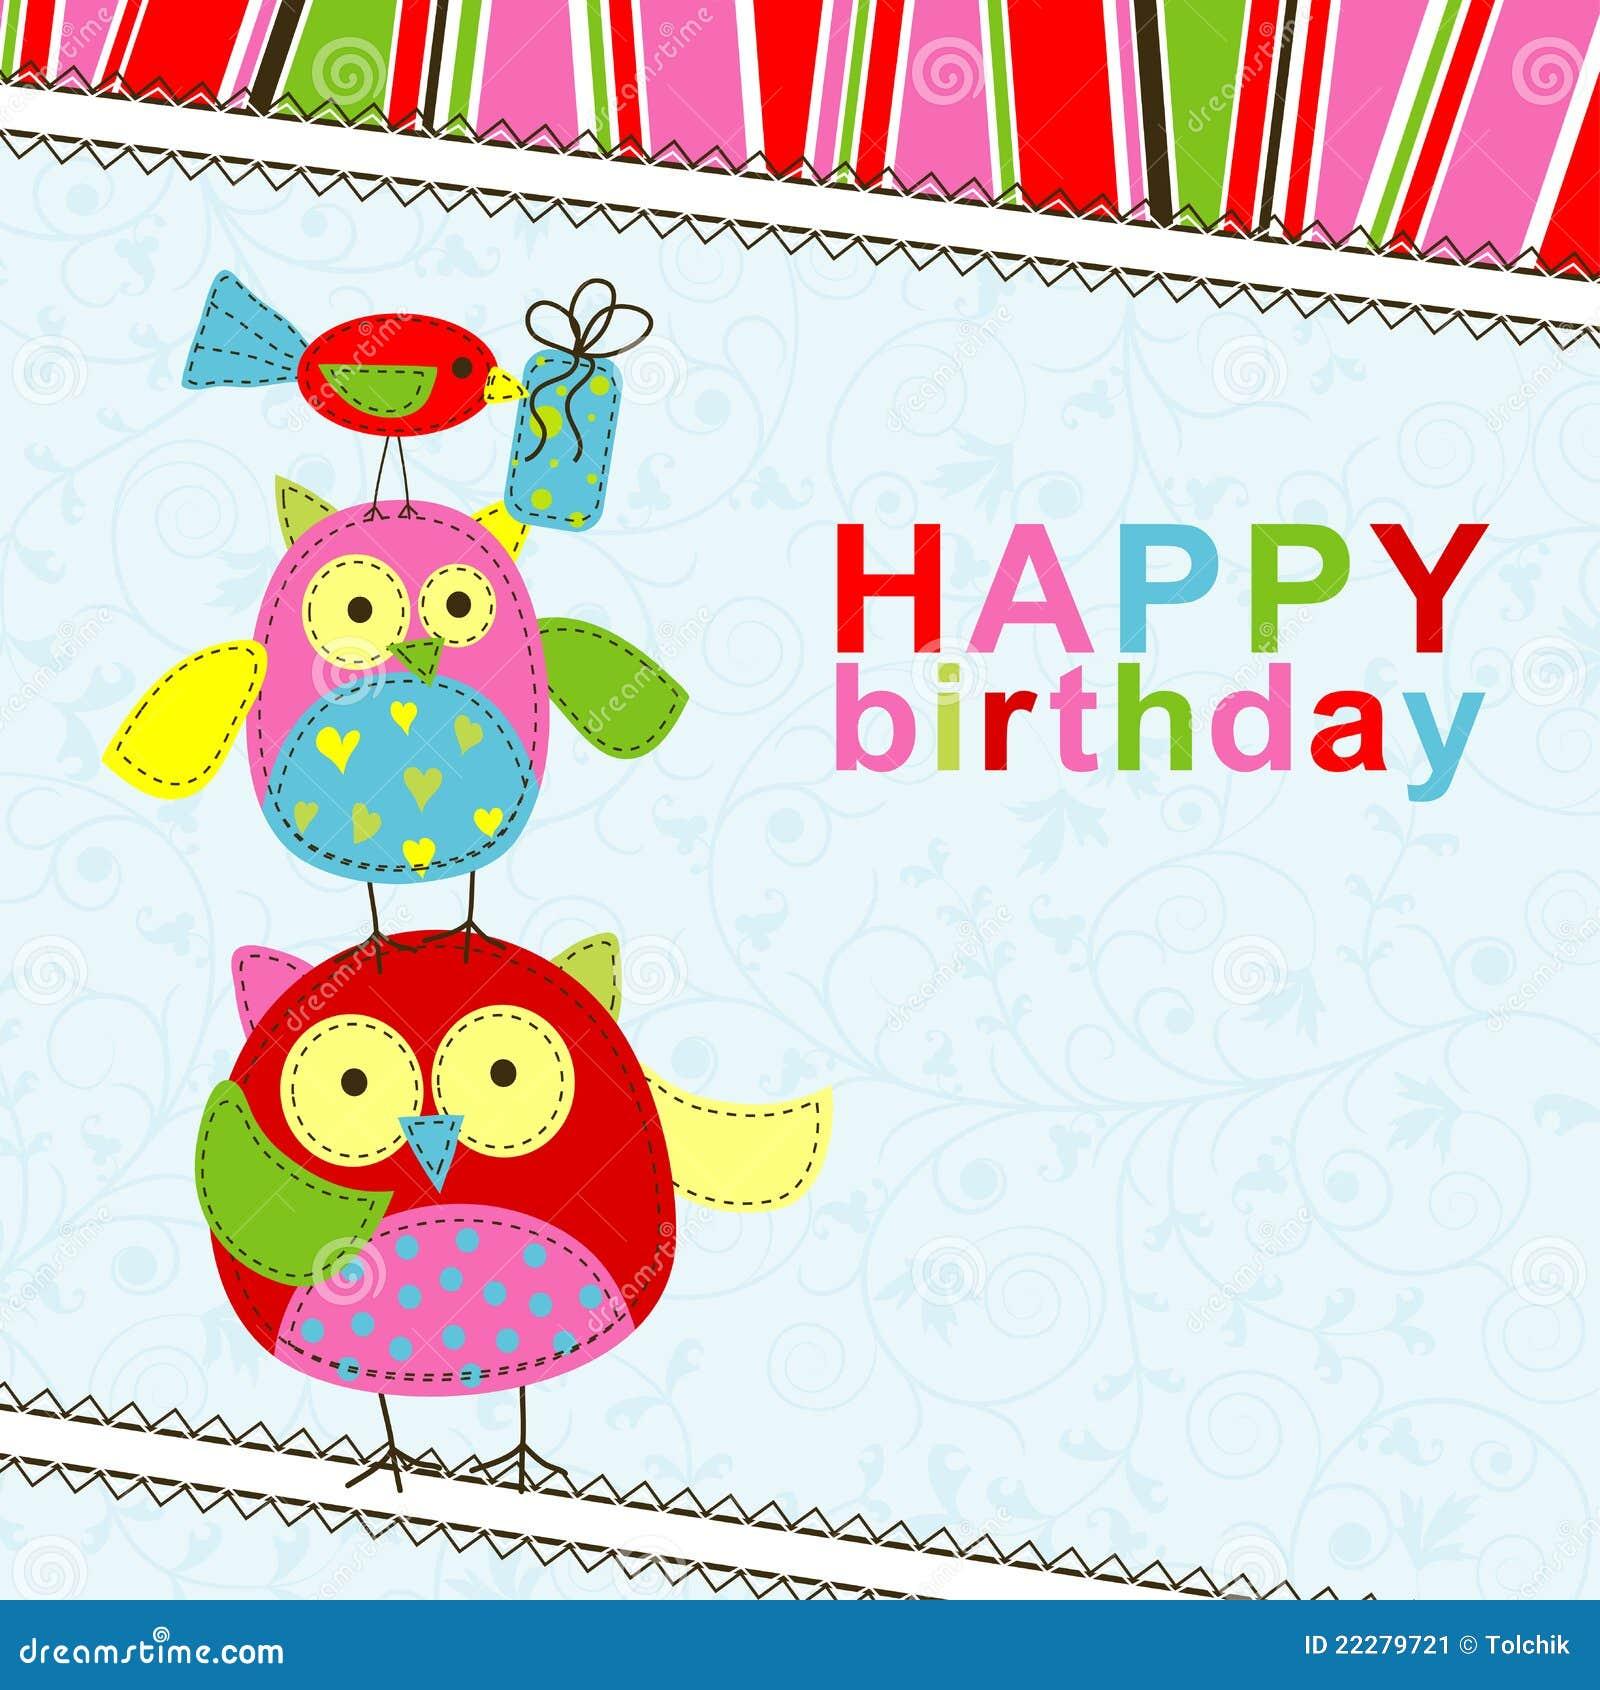 Template Birthday Greeting Card Stock Image - Image: 22279721